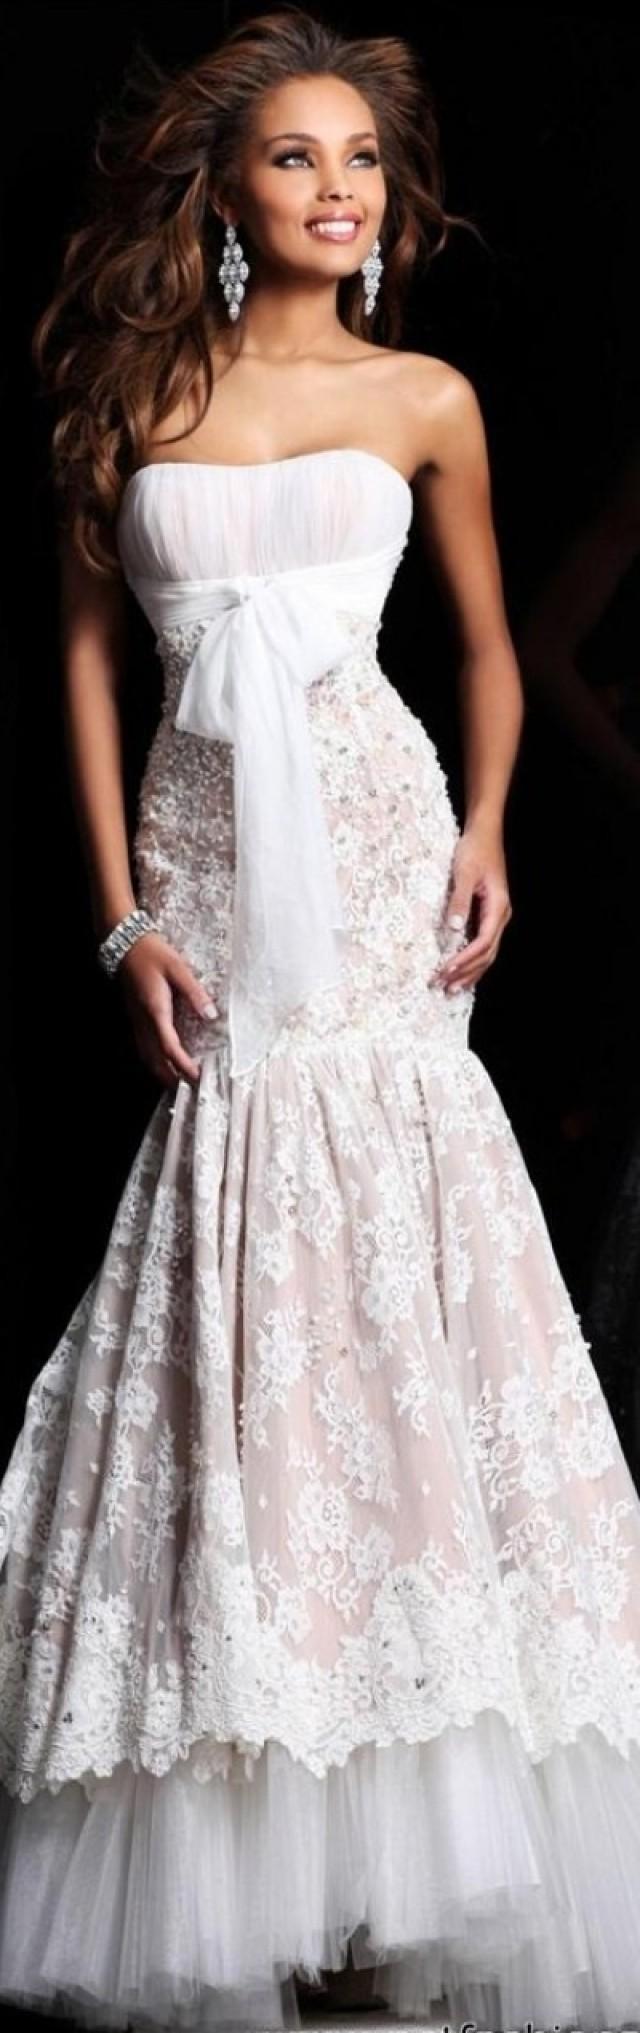 Dress sherri hill couture 2013 2062665 weddbook for Sherri hill wedding dresses